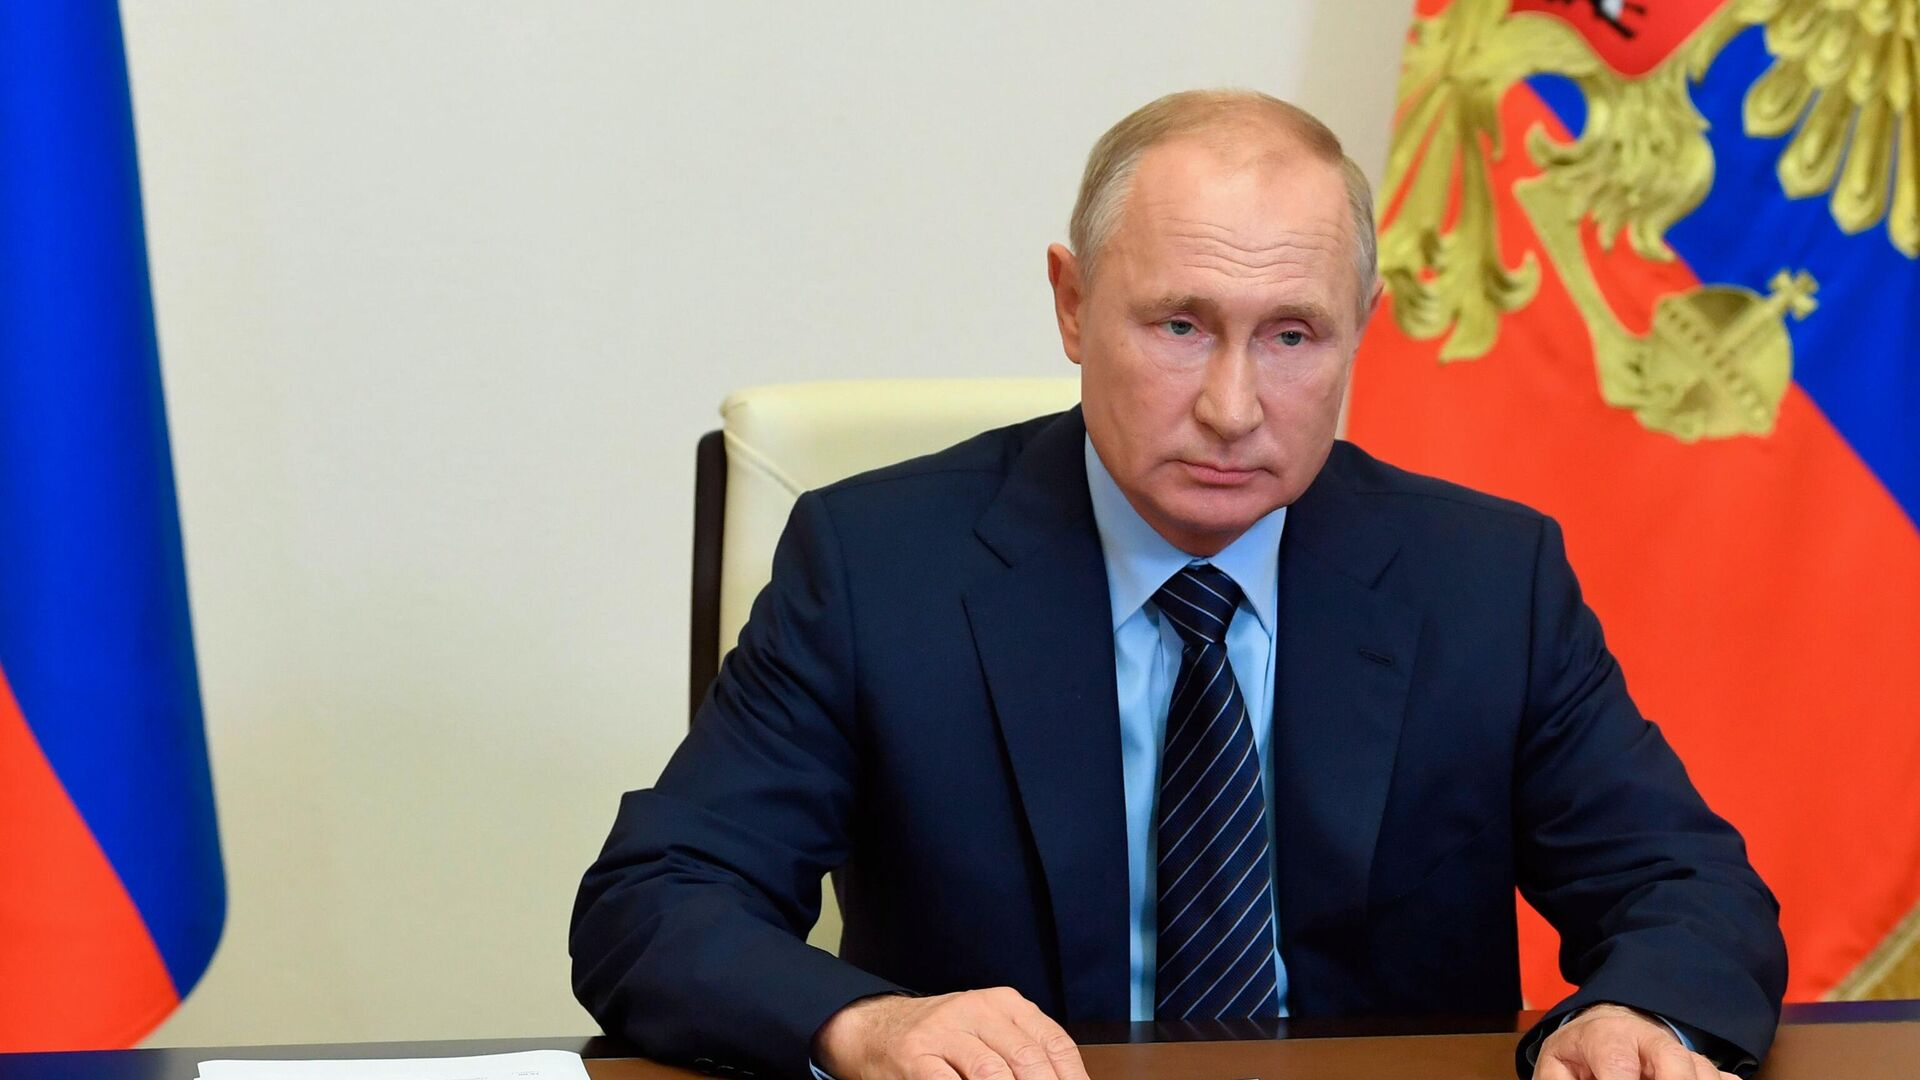 Президент РФ Владимир Путин - РИА Новости, 1920, 30.07.2020